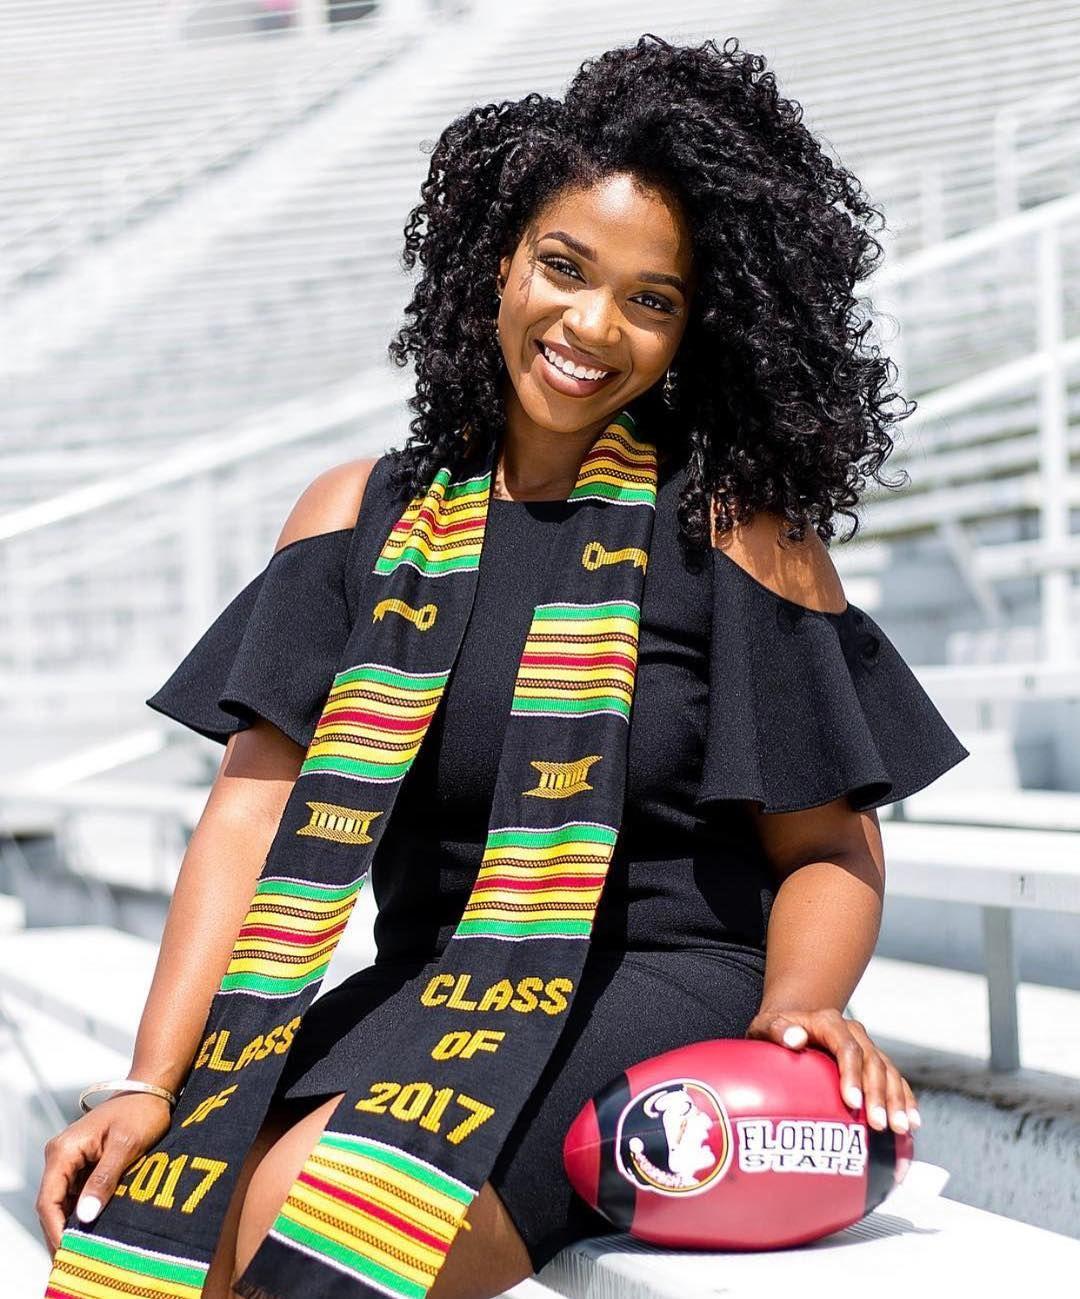 Amazing Black Girls Graduating Add Your Own Graduation -6814